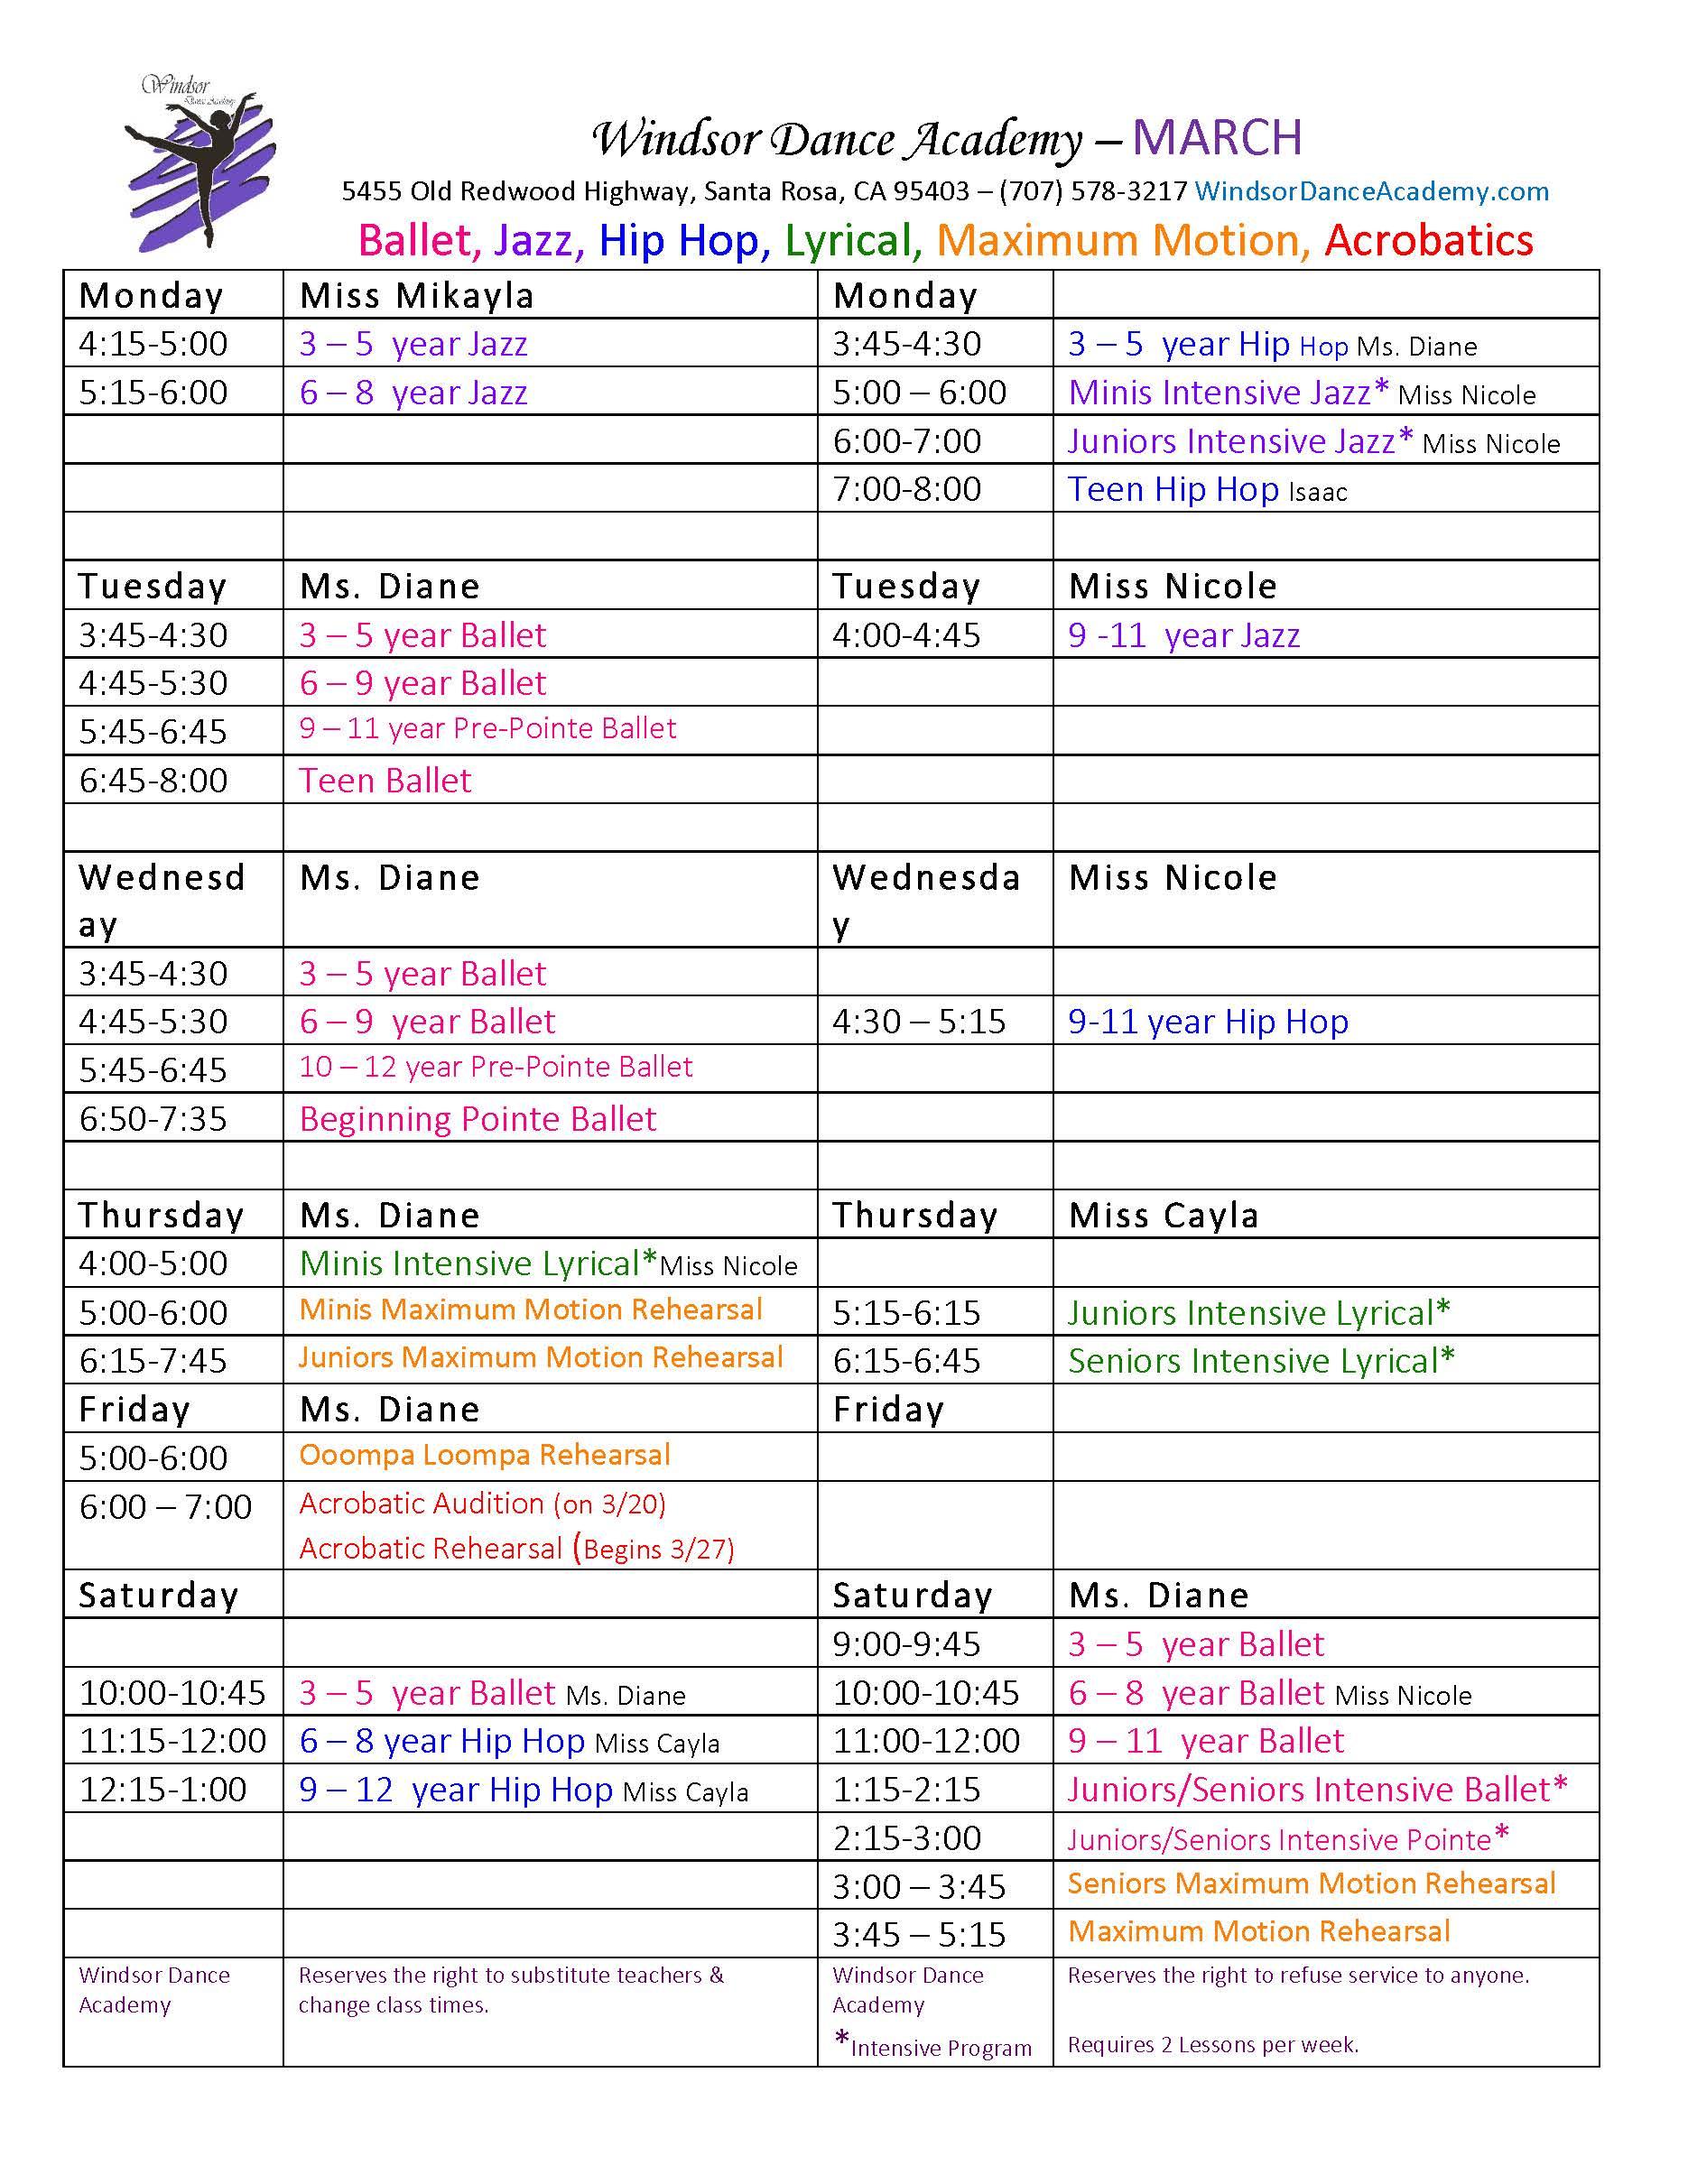 Windsor Dance Academy Schedule March 2020